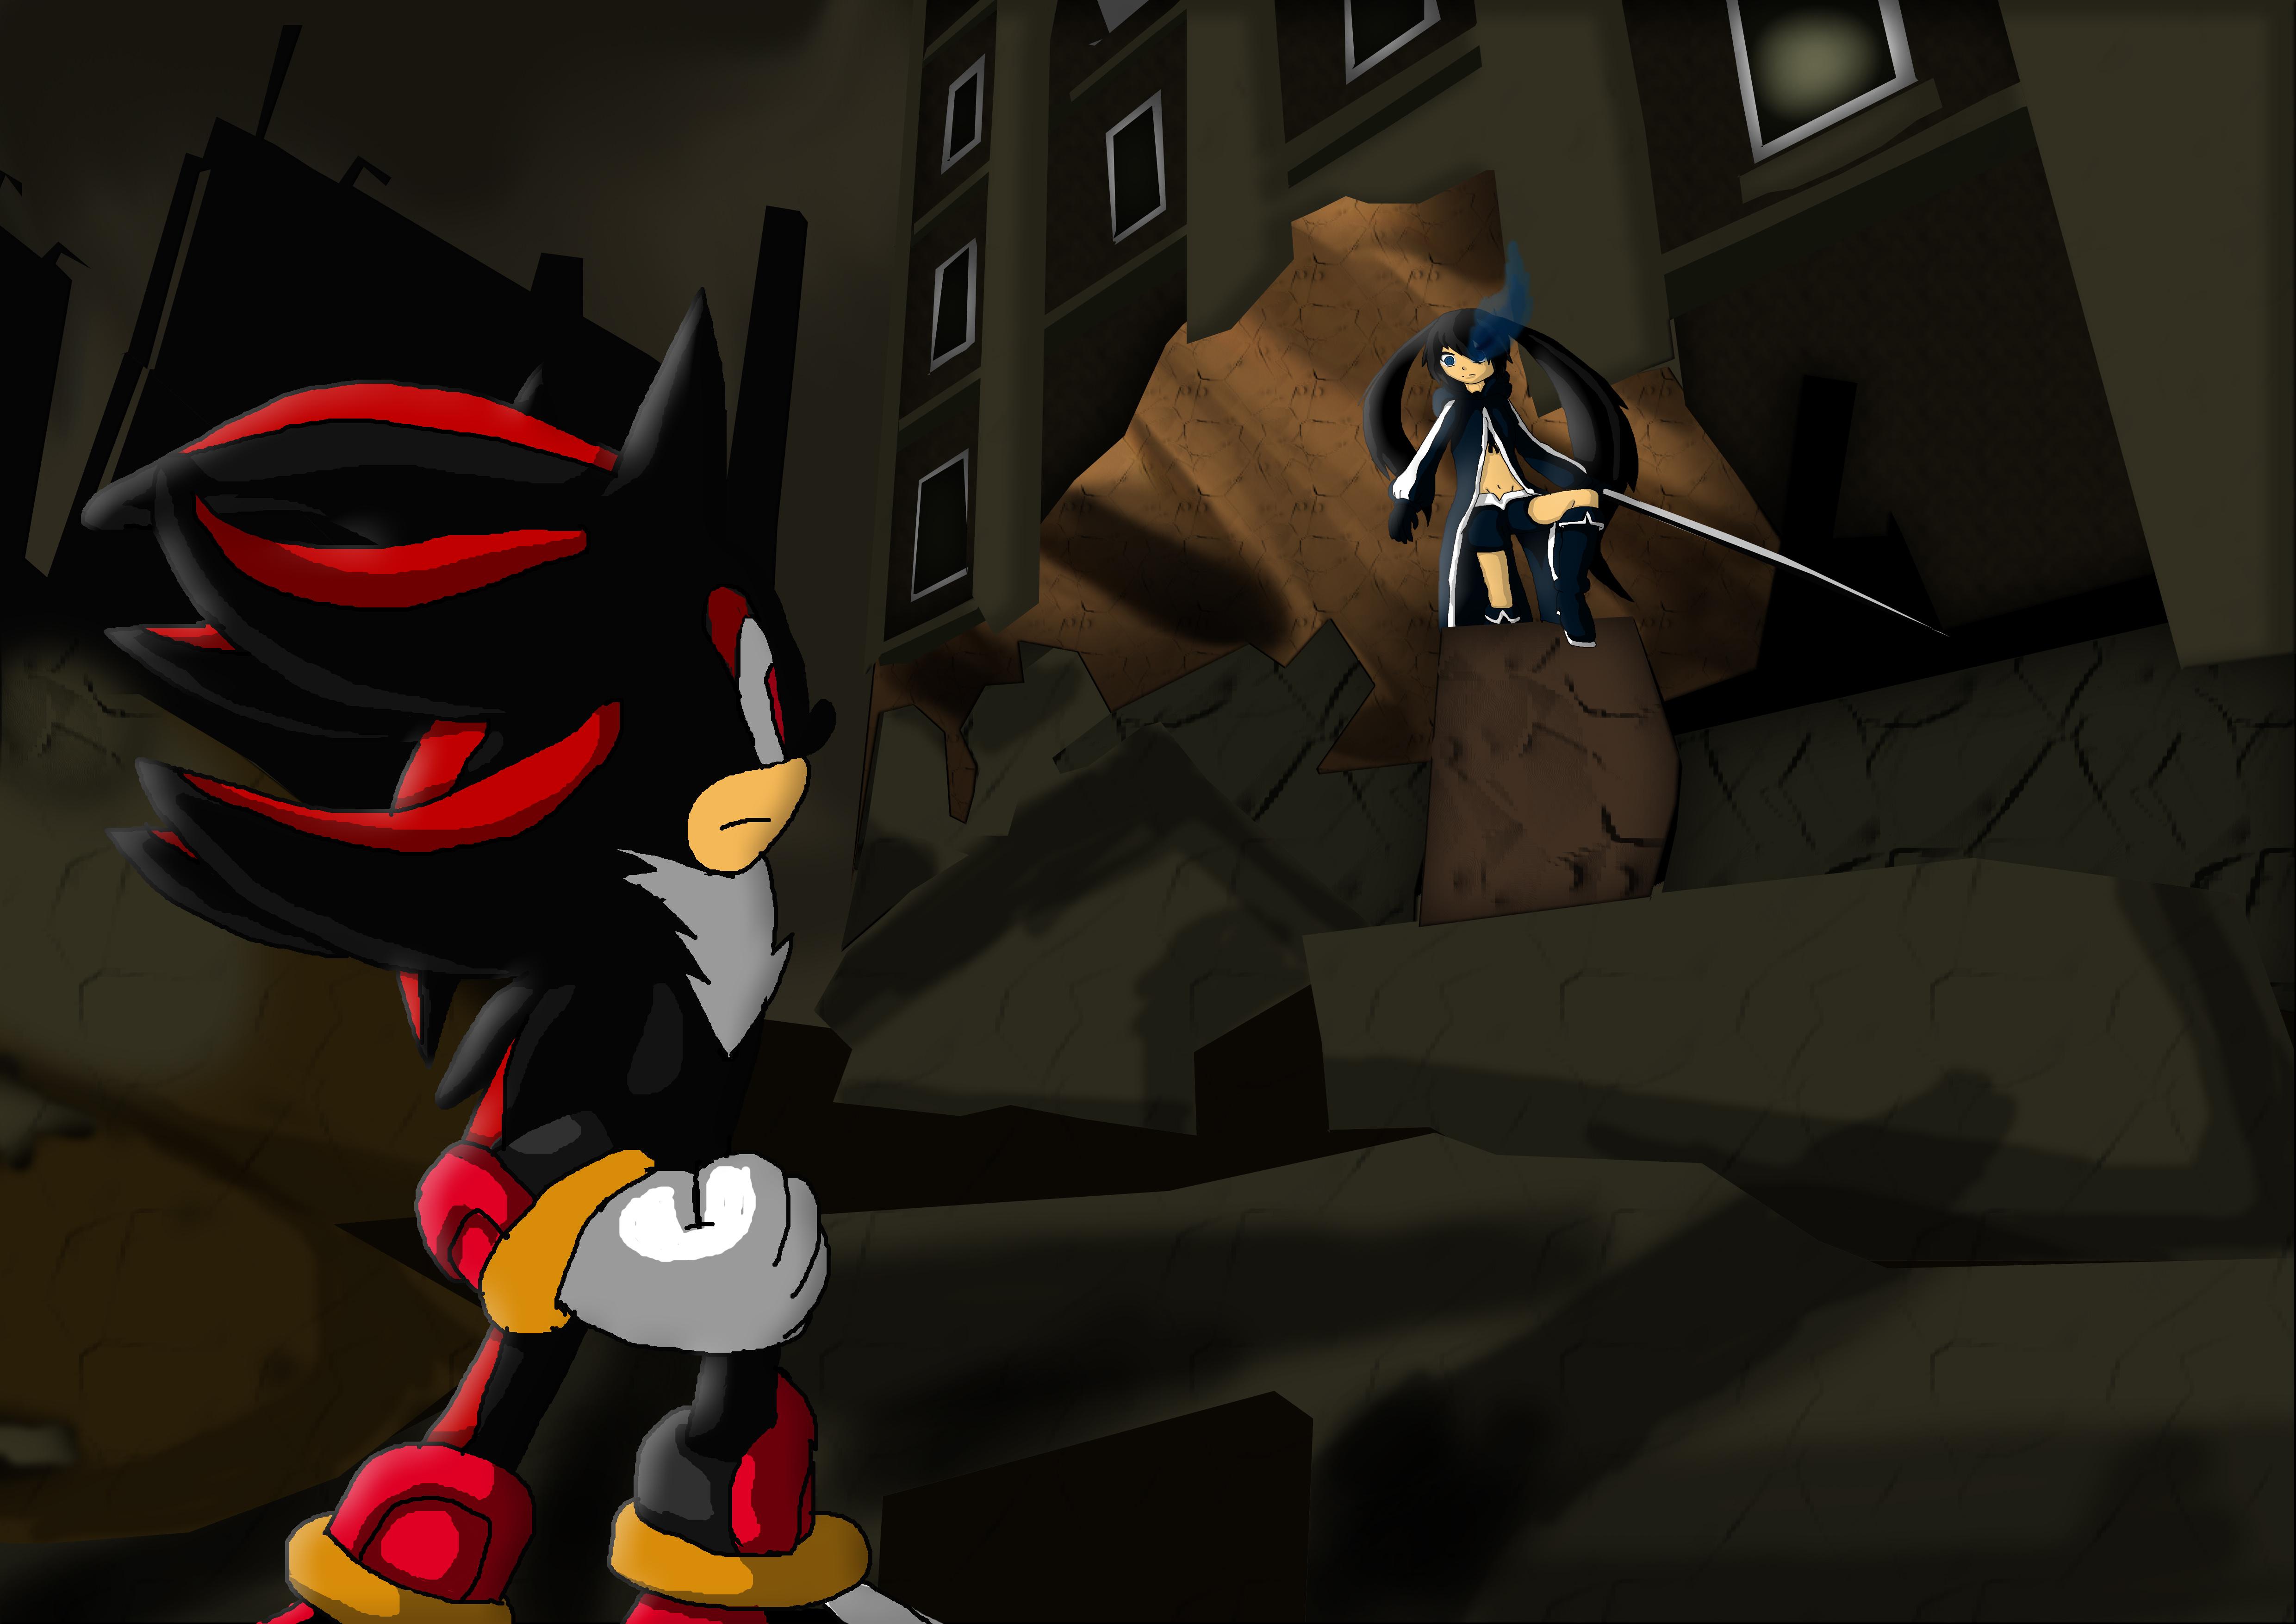 Shadow vs. Black Rock Shooter